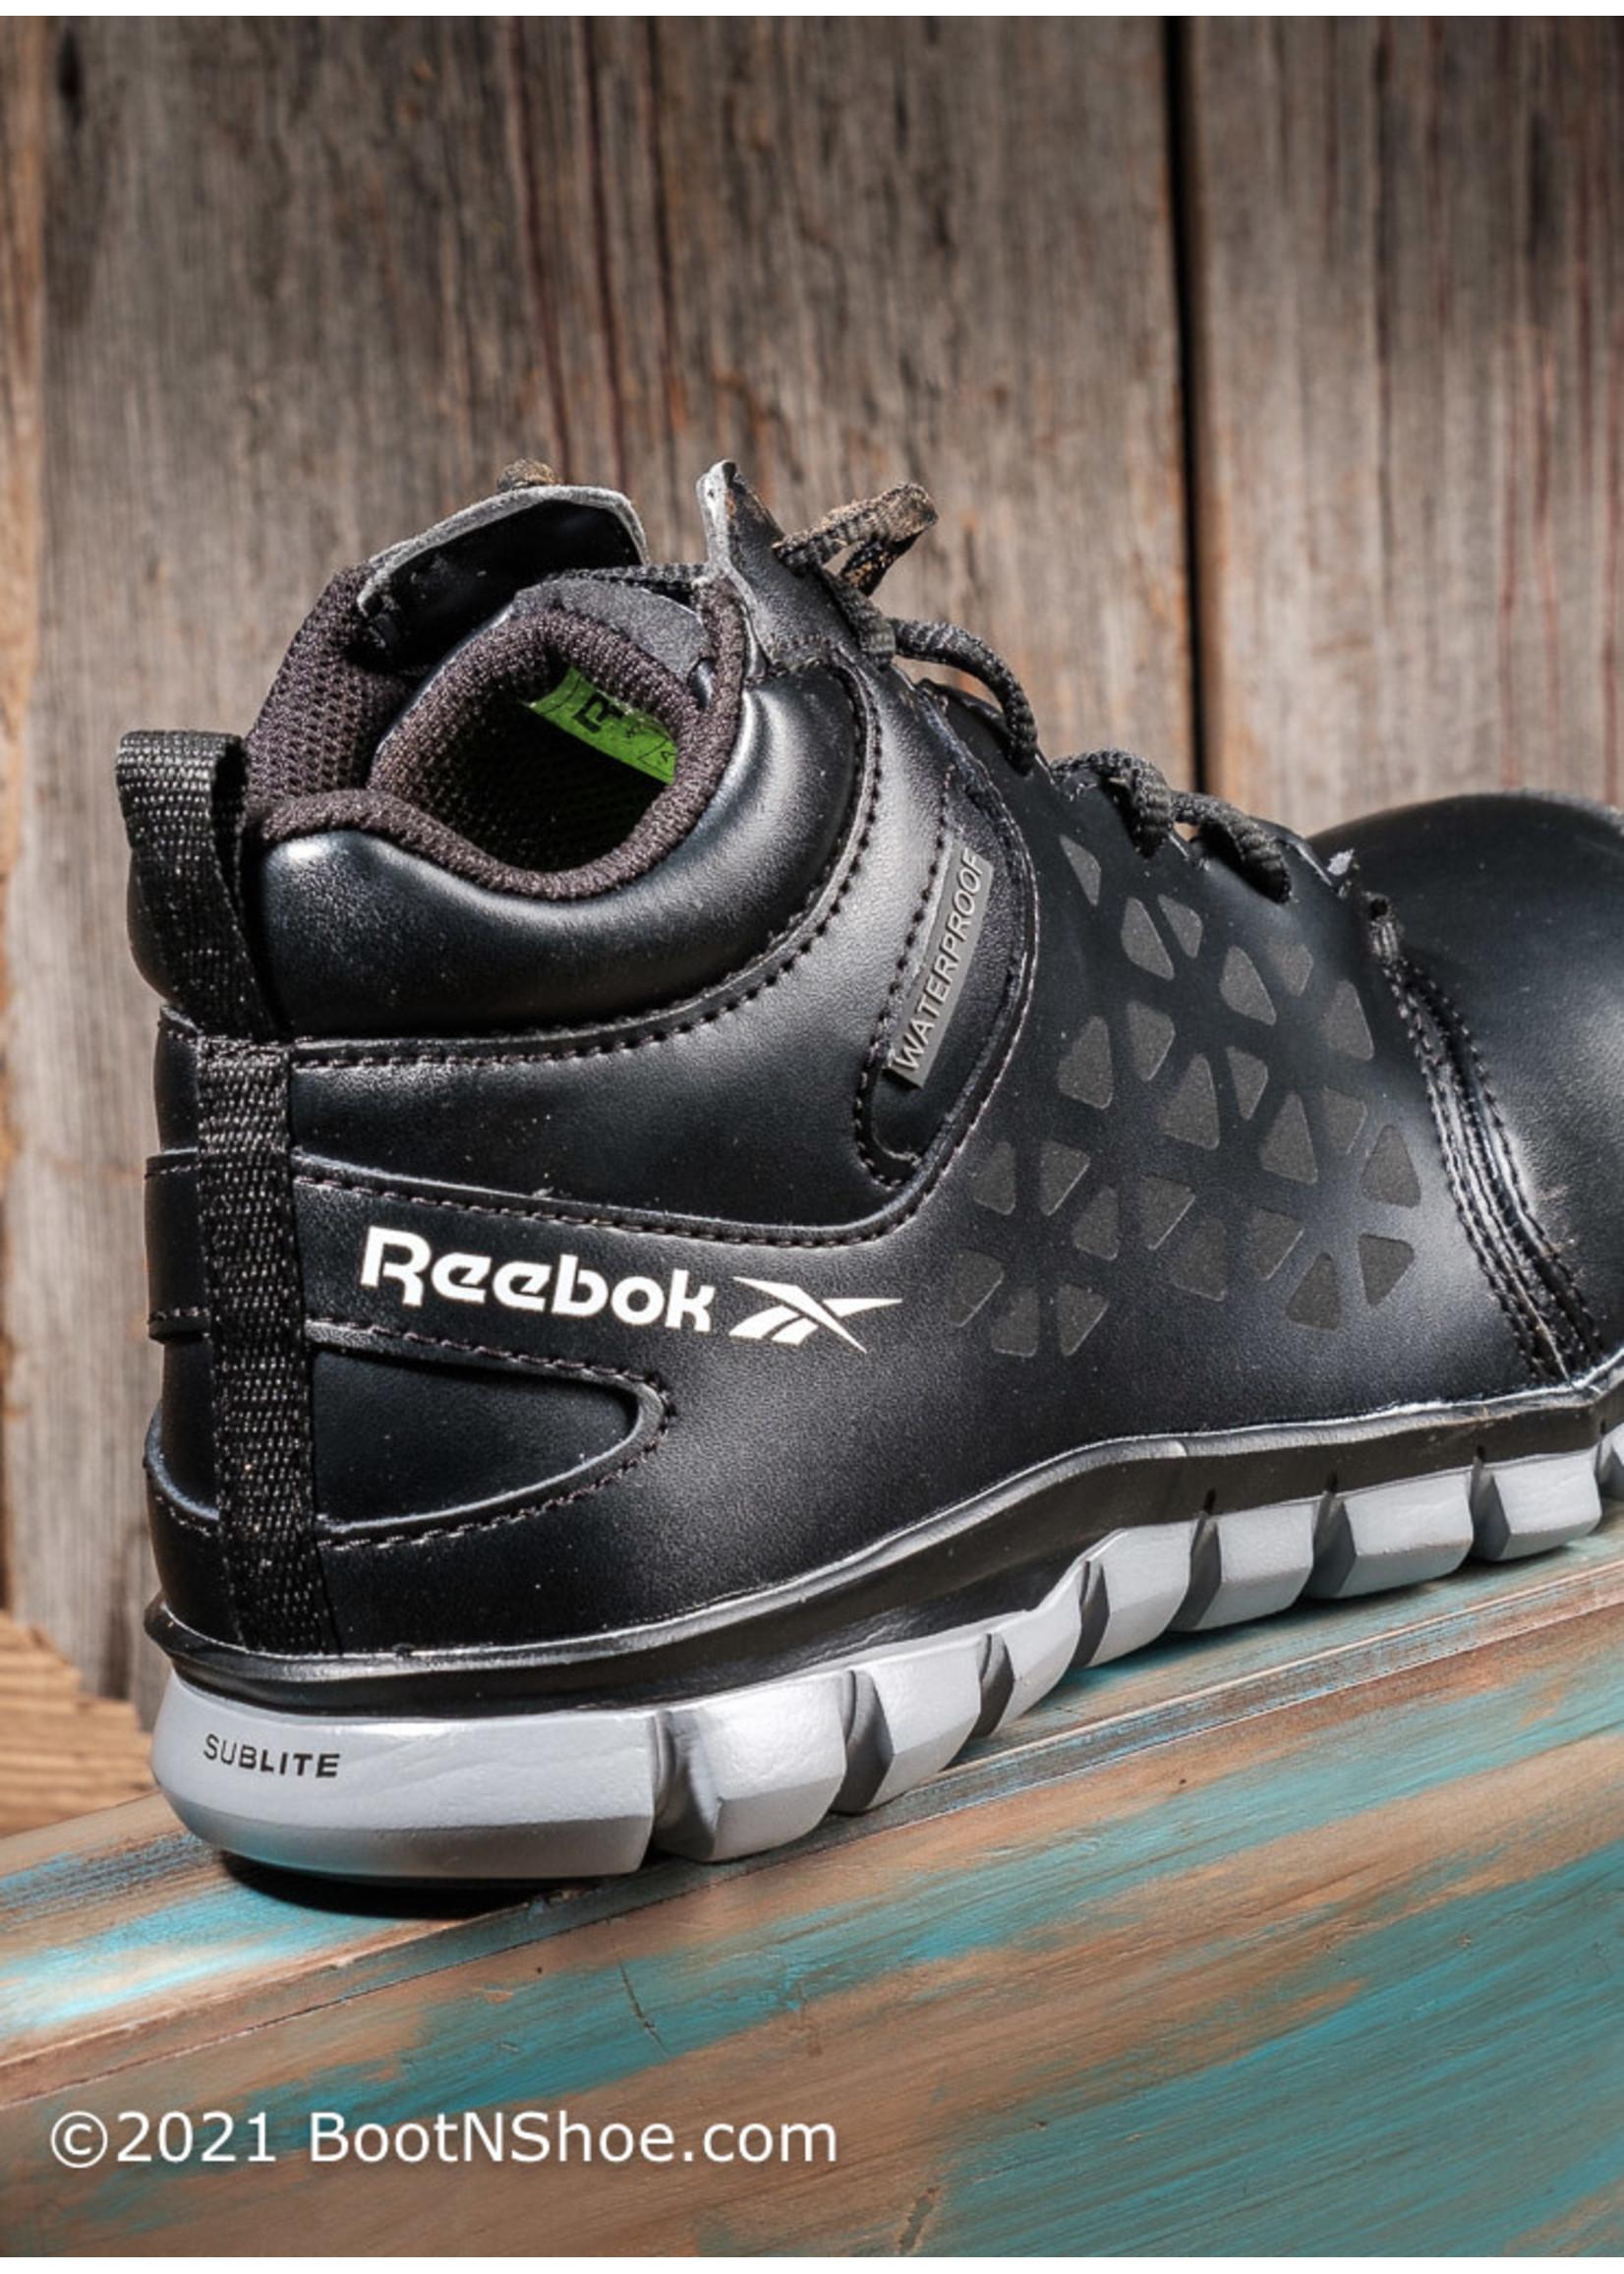 Reebok Men's Waterproof Sublite Cushion Mid-Cut Composite Toe Work Shoe RB4144